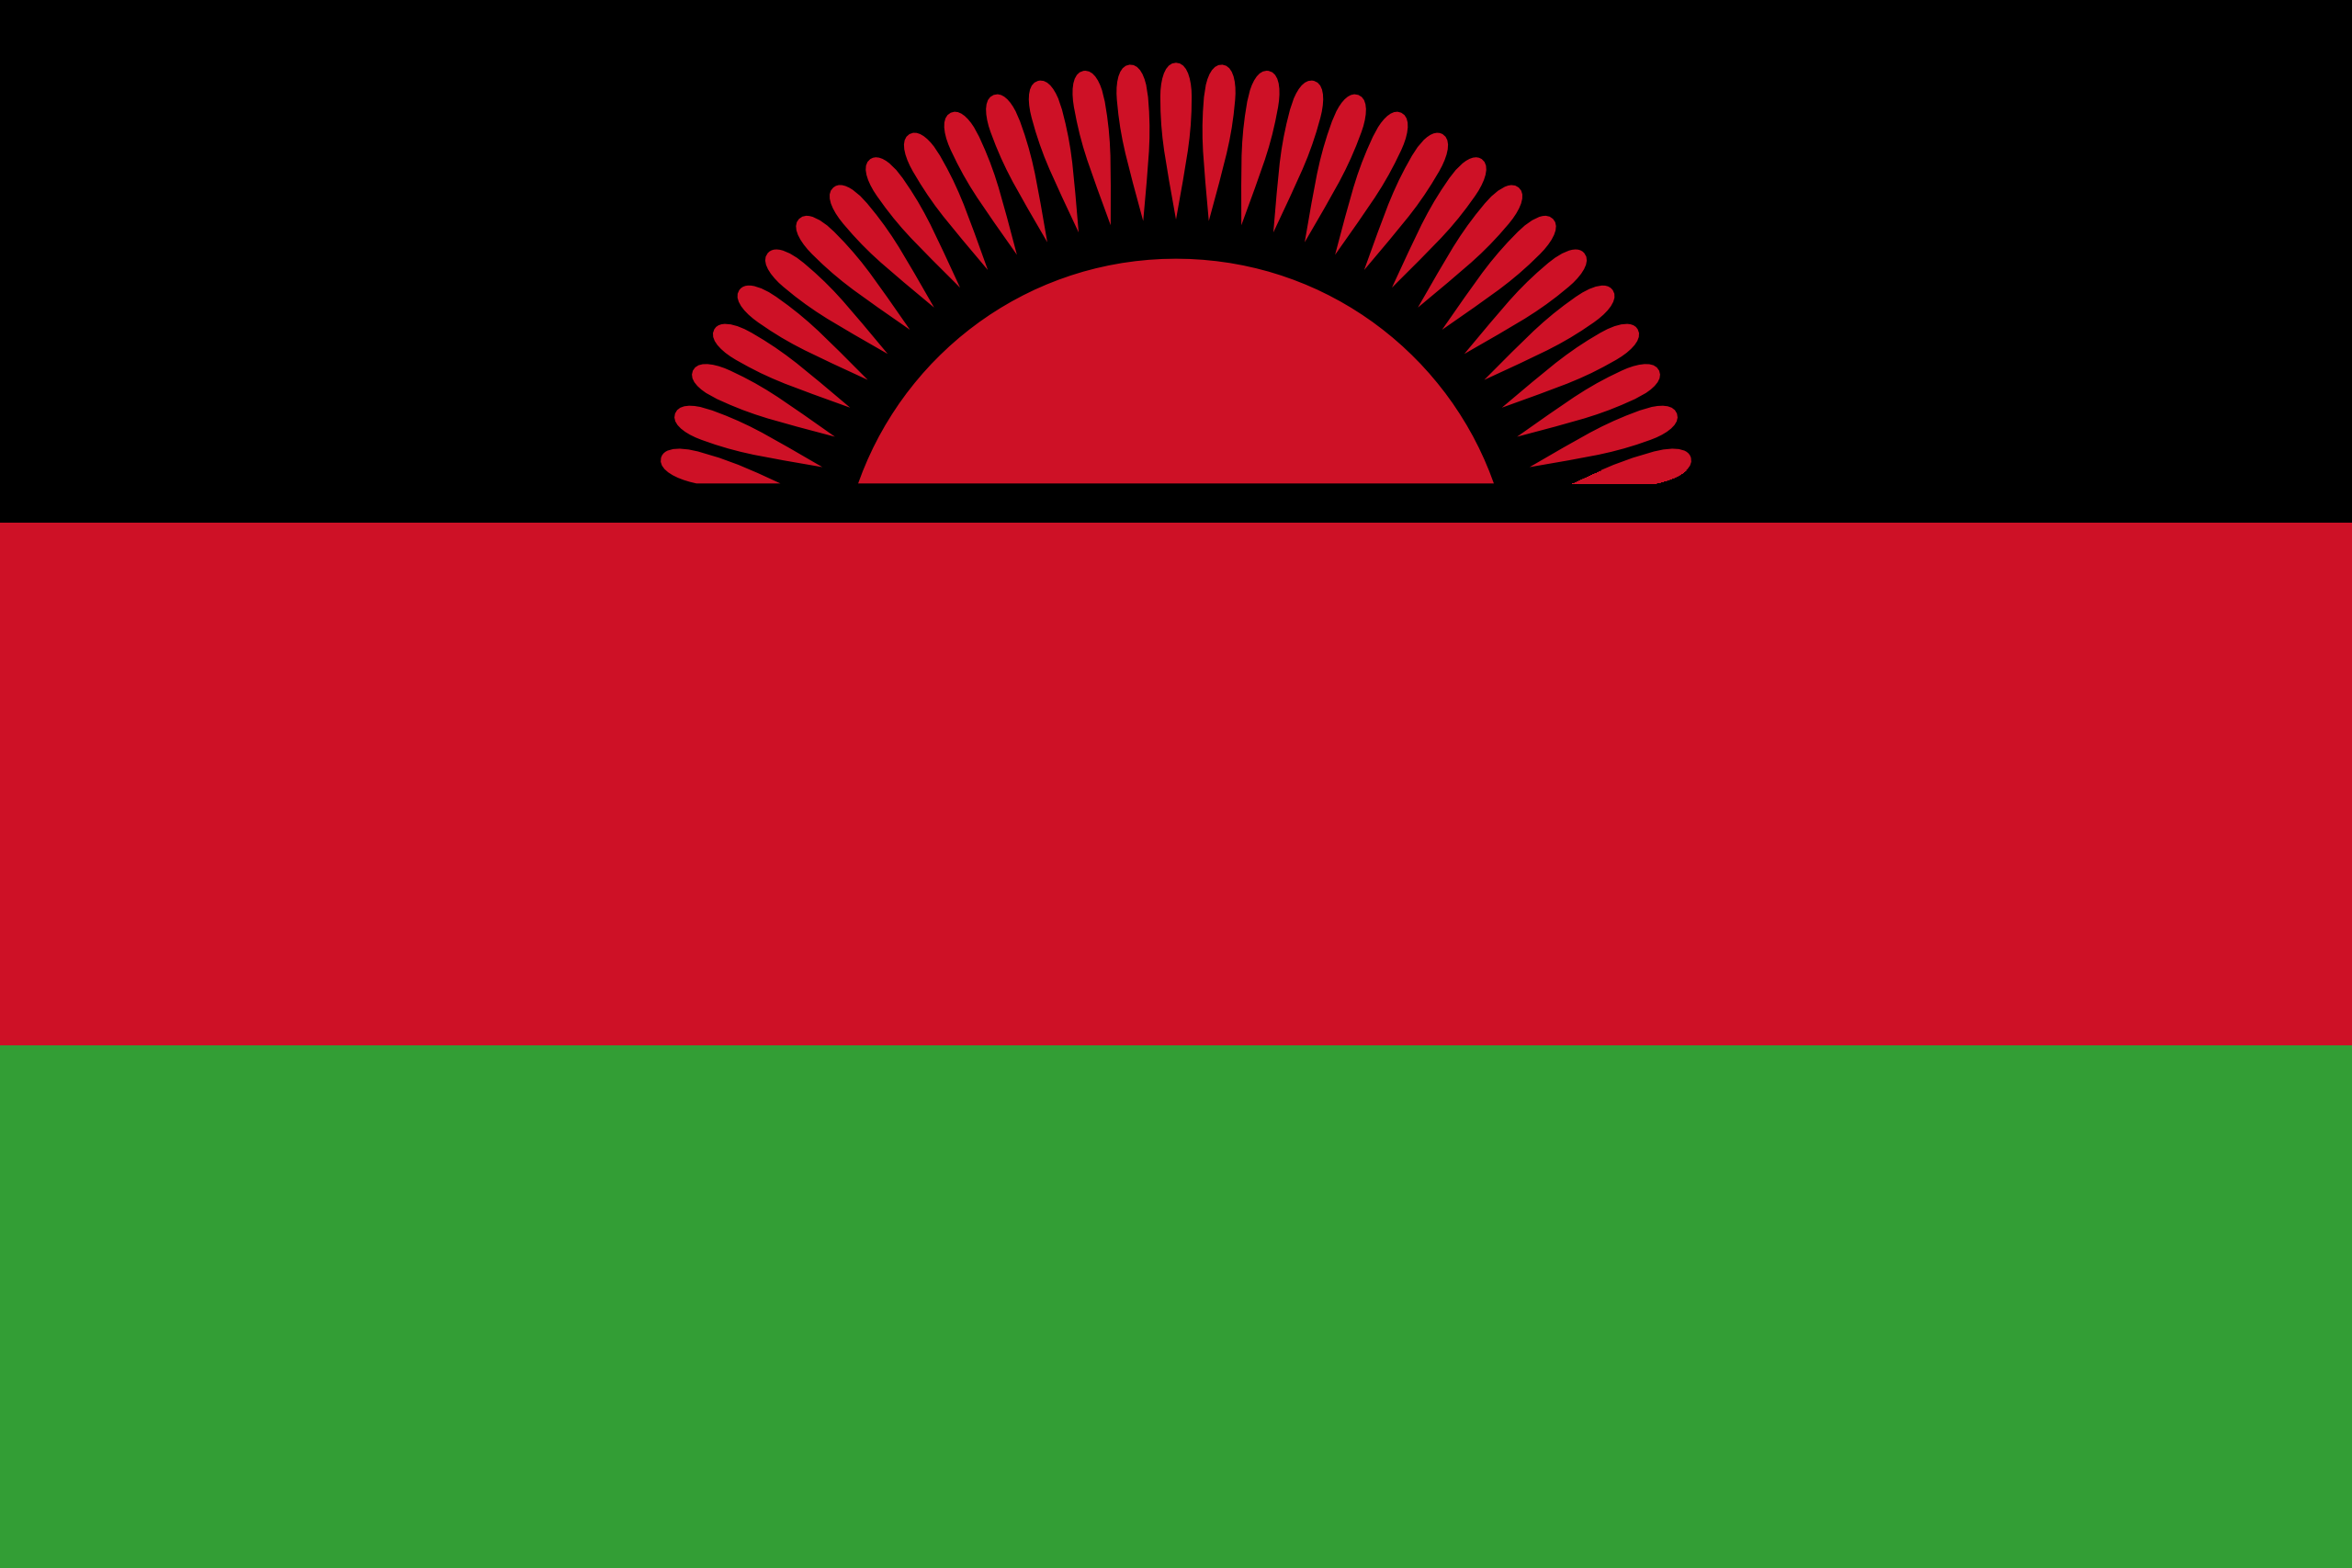 malawi, देश, emblema, लोग�प्रतीकbolo - HD वॉलपेपर - प्रोफेसर-falken.com